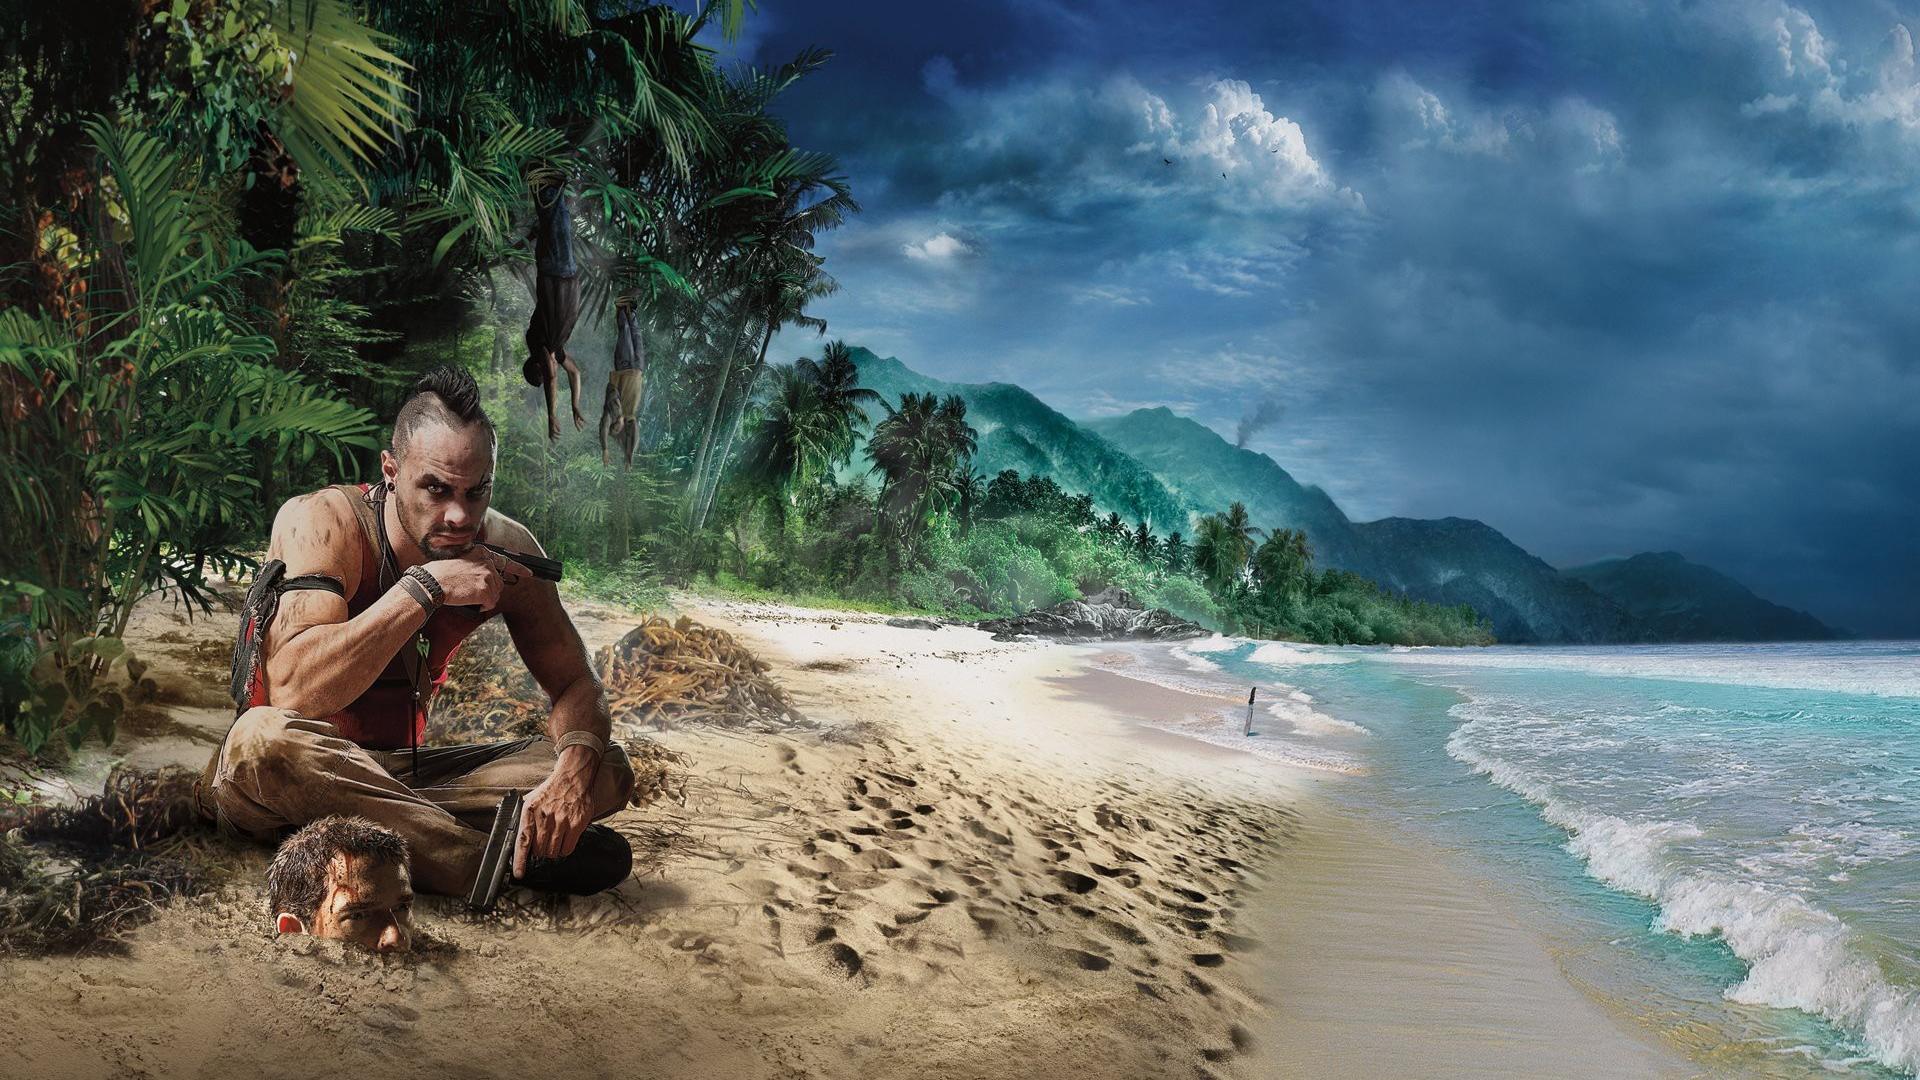 Far-Cry-3-Beach-1080x1920_20130308194805.jpg